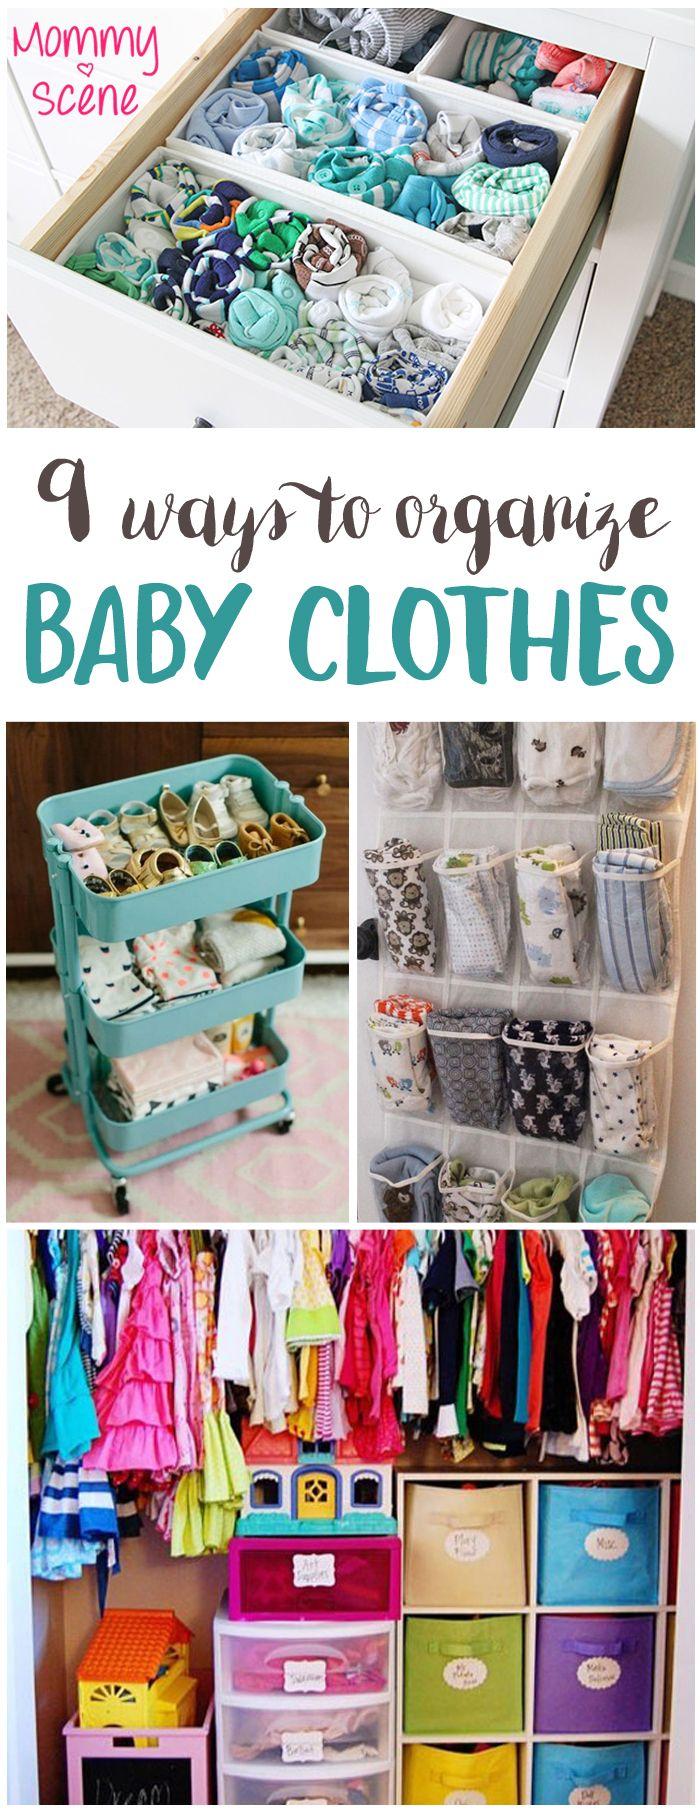 Home Create Play Travel Baby Organization Baby Storage